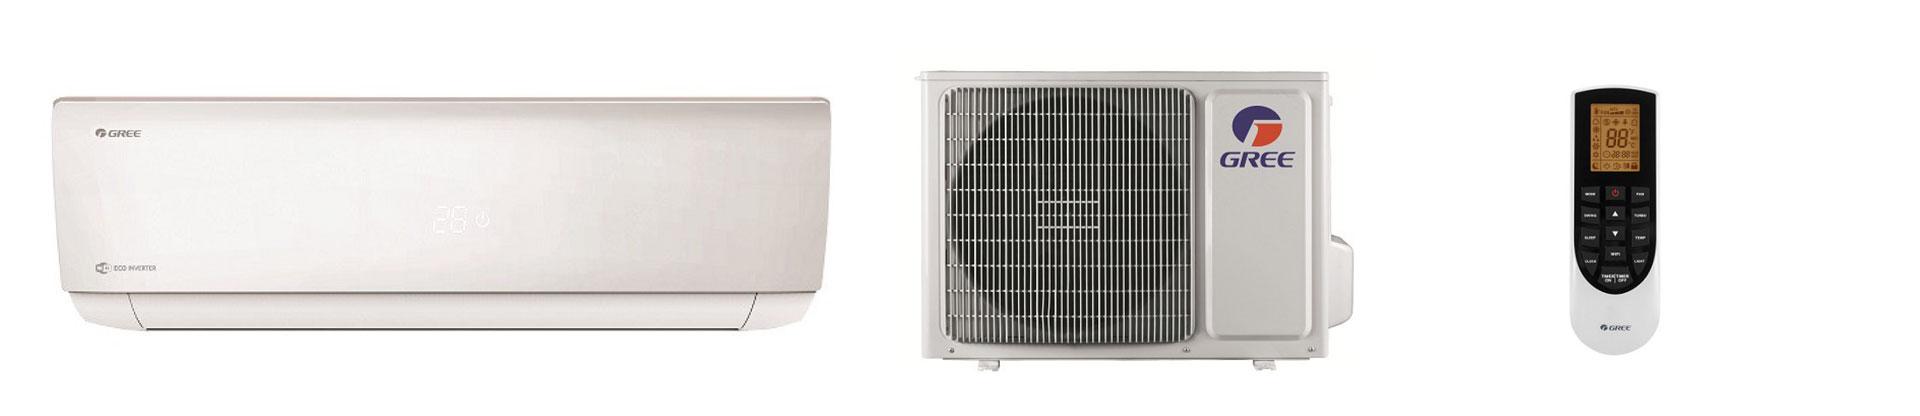 Aparat de aer conditionat tip split Gree Bora A4 SILVER Inverter, R32, Wifi, A++, Kit de instalare inclus 27